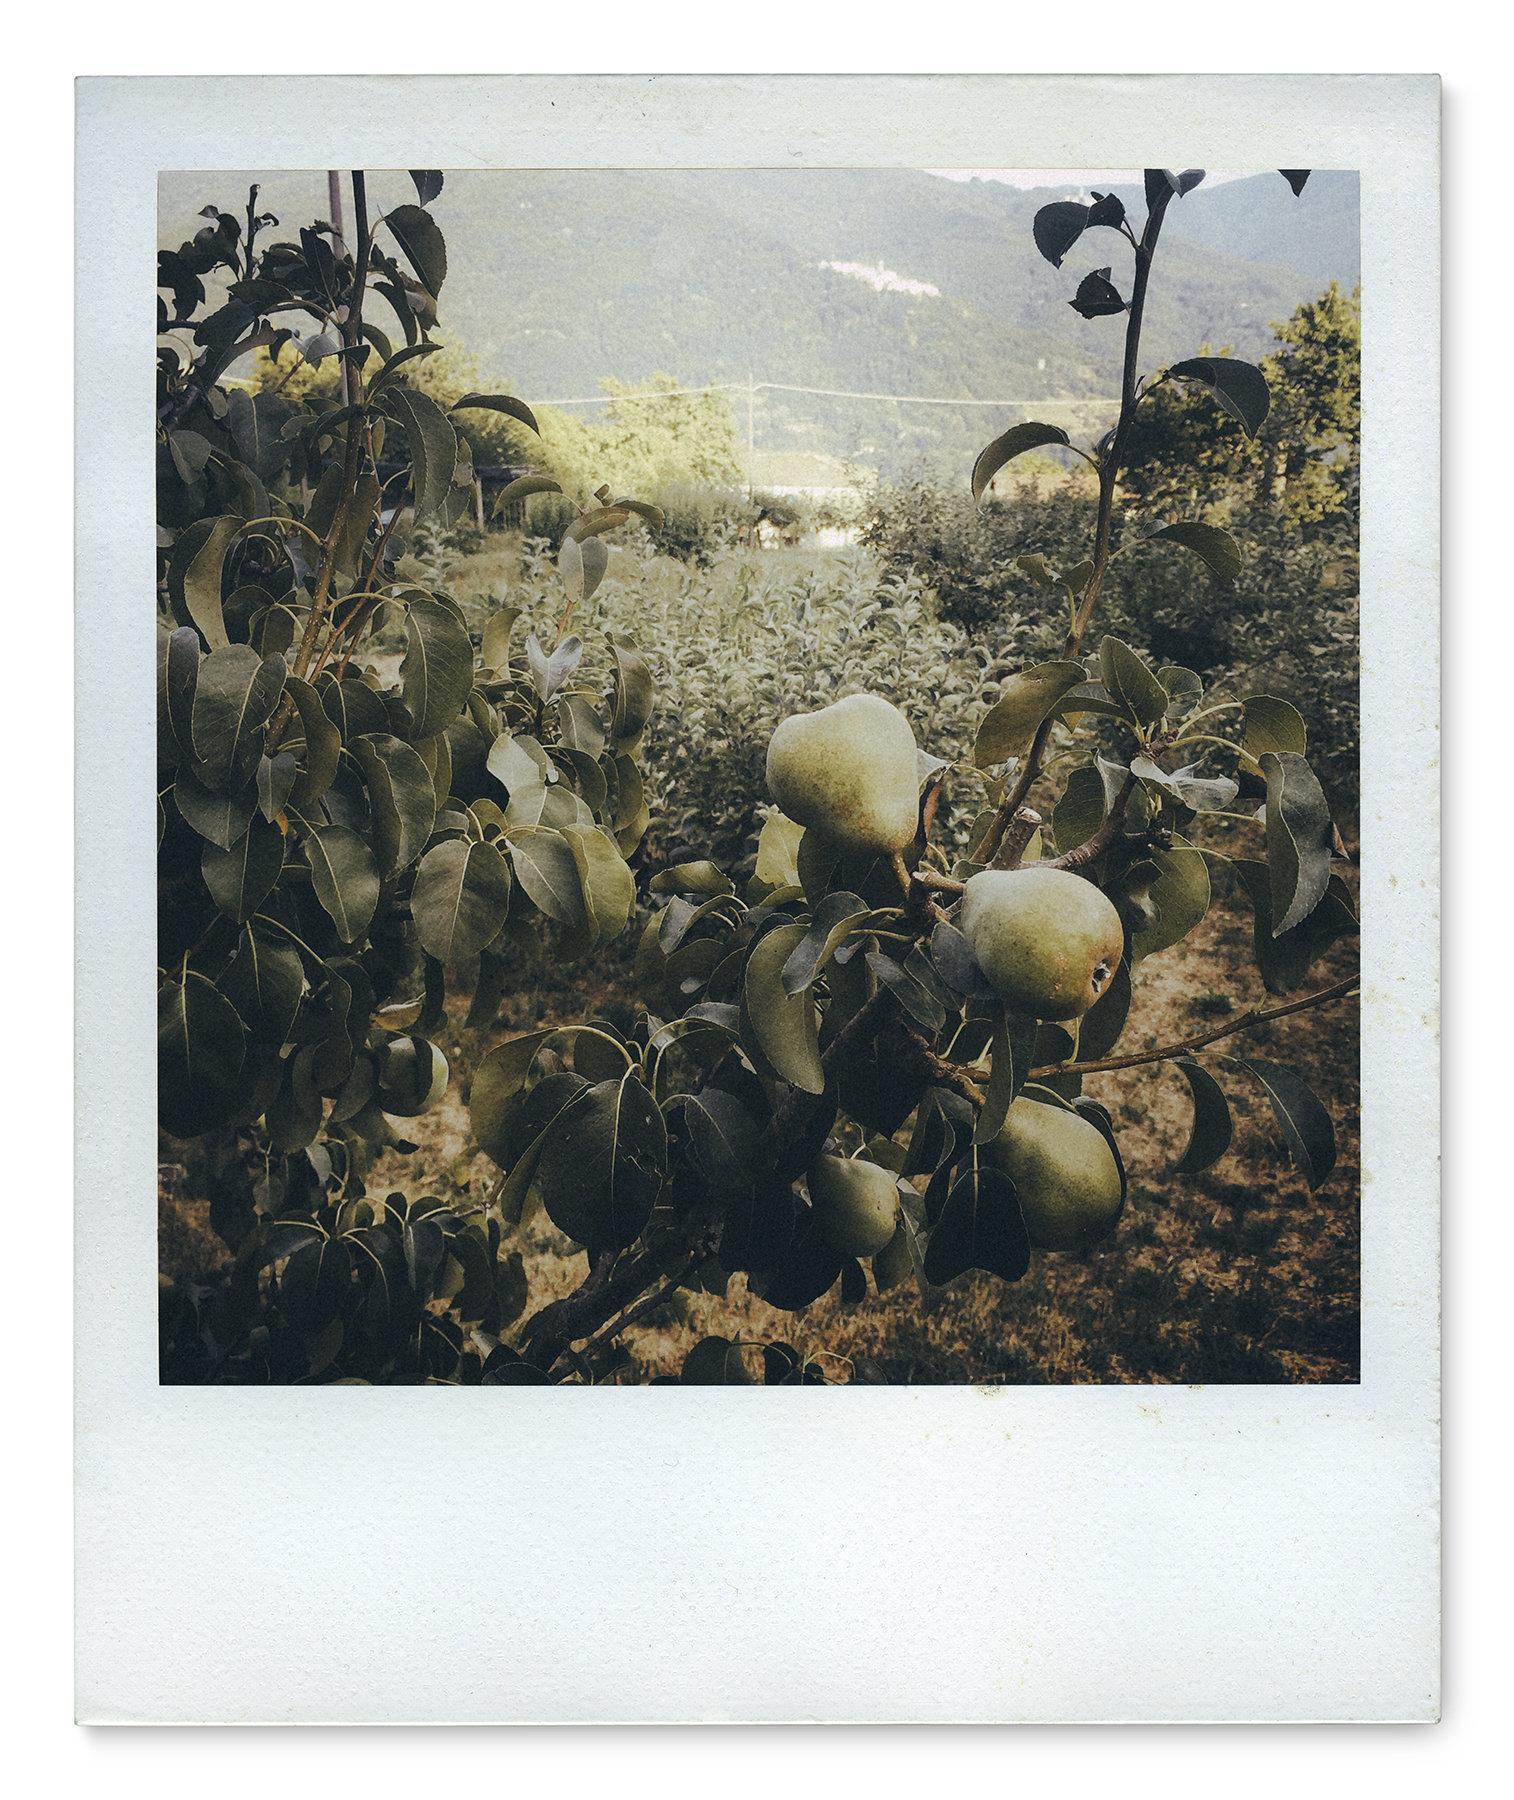 051_Polaroid SX70_IMG_2567.jpg